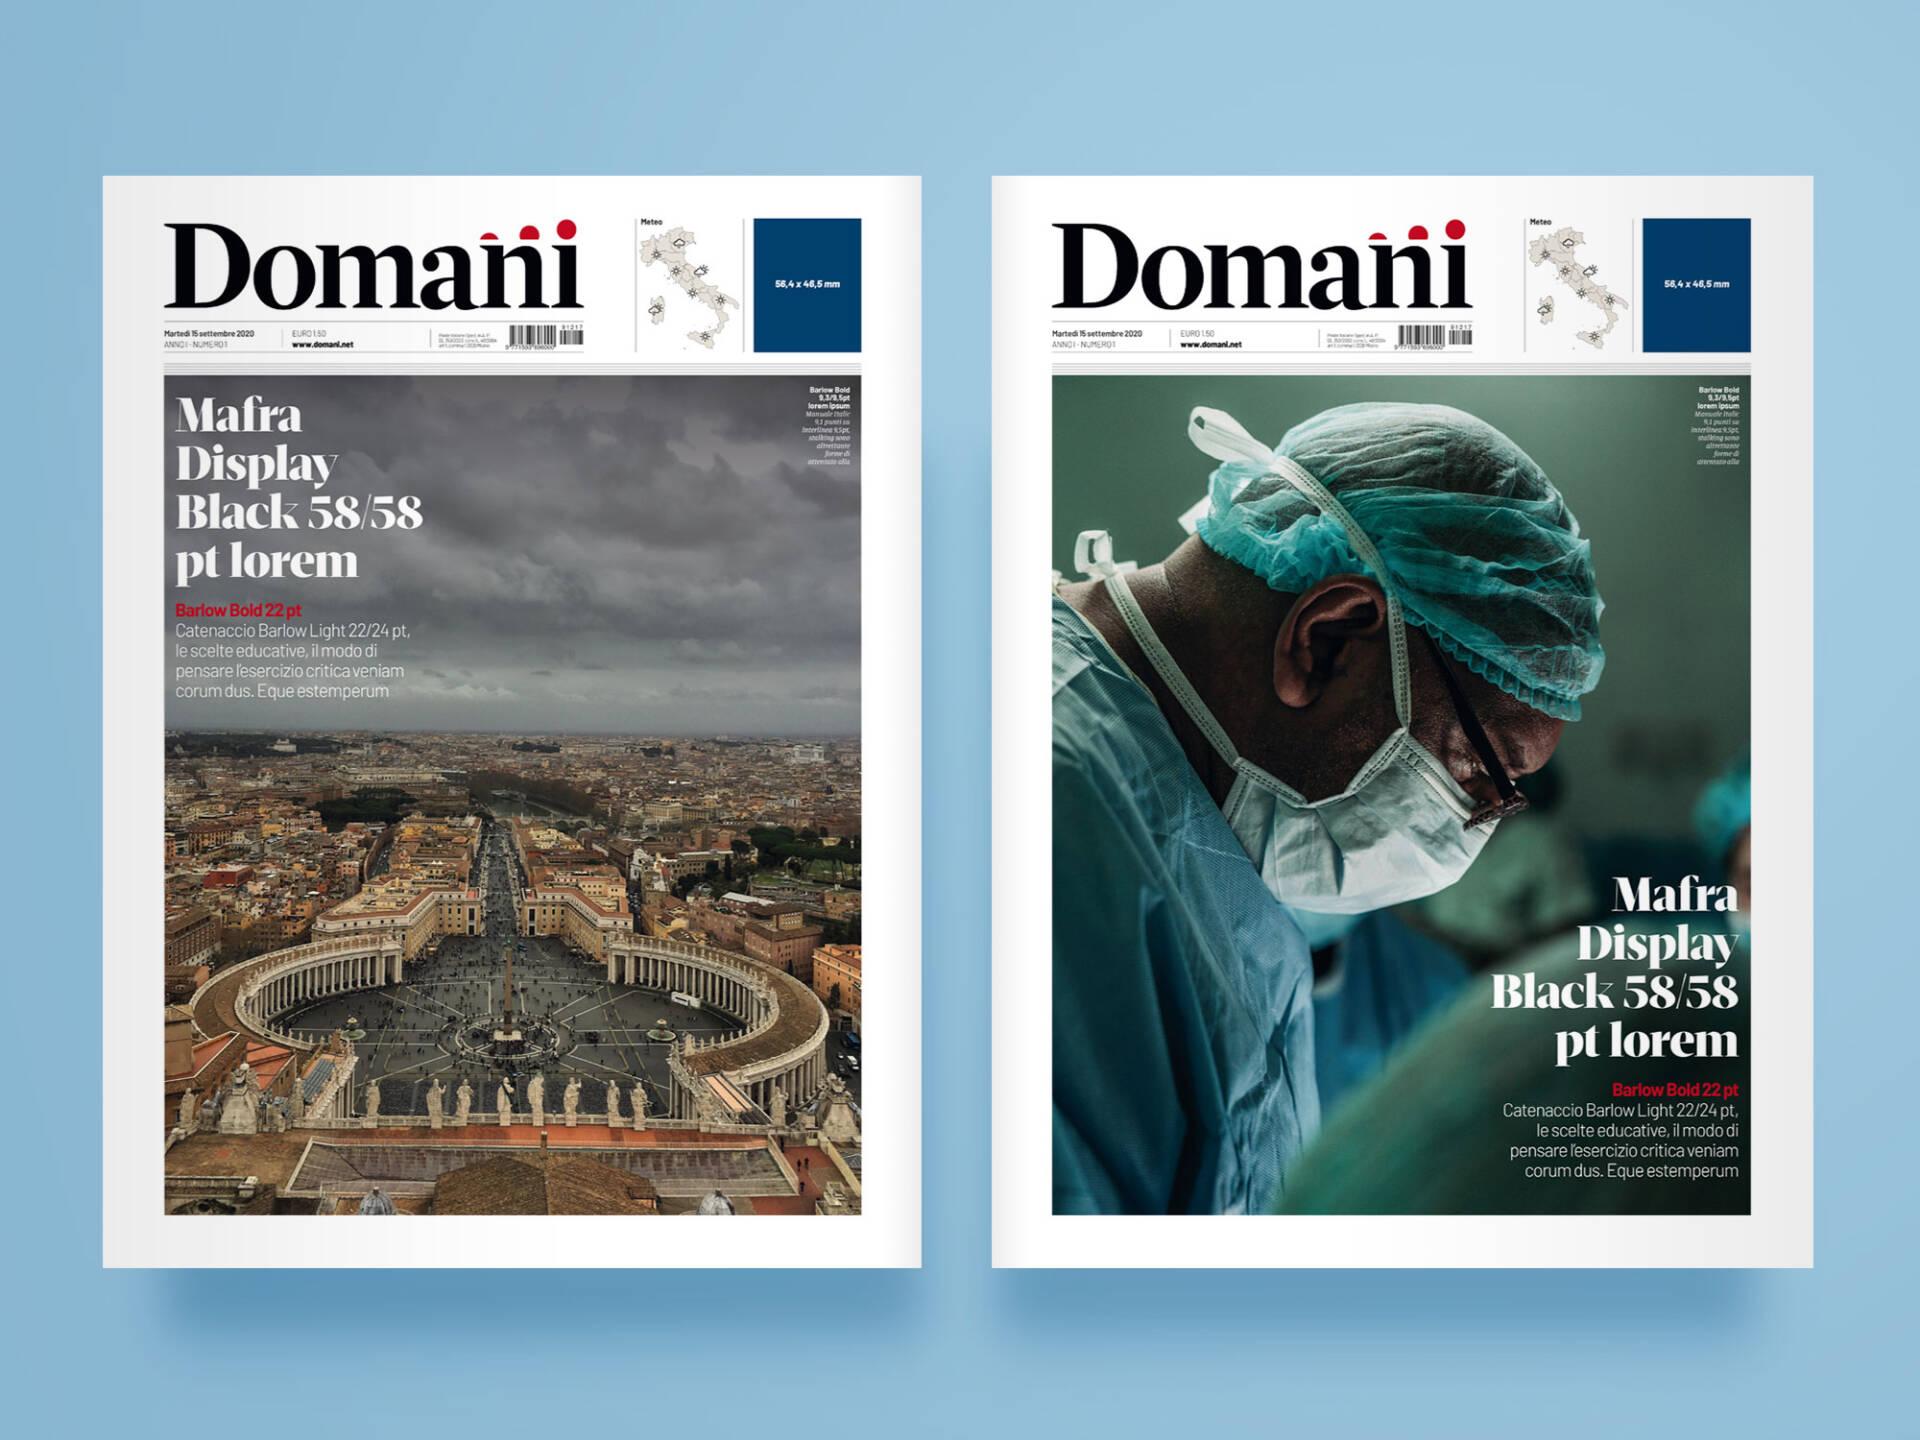 Domani_Print_Frontpage_Wenceslau_News_Design02